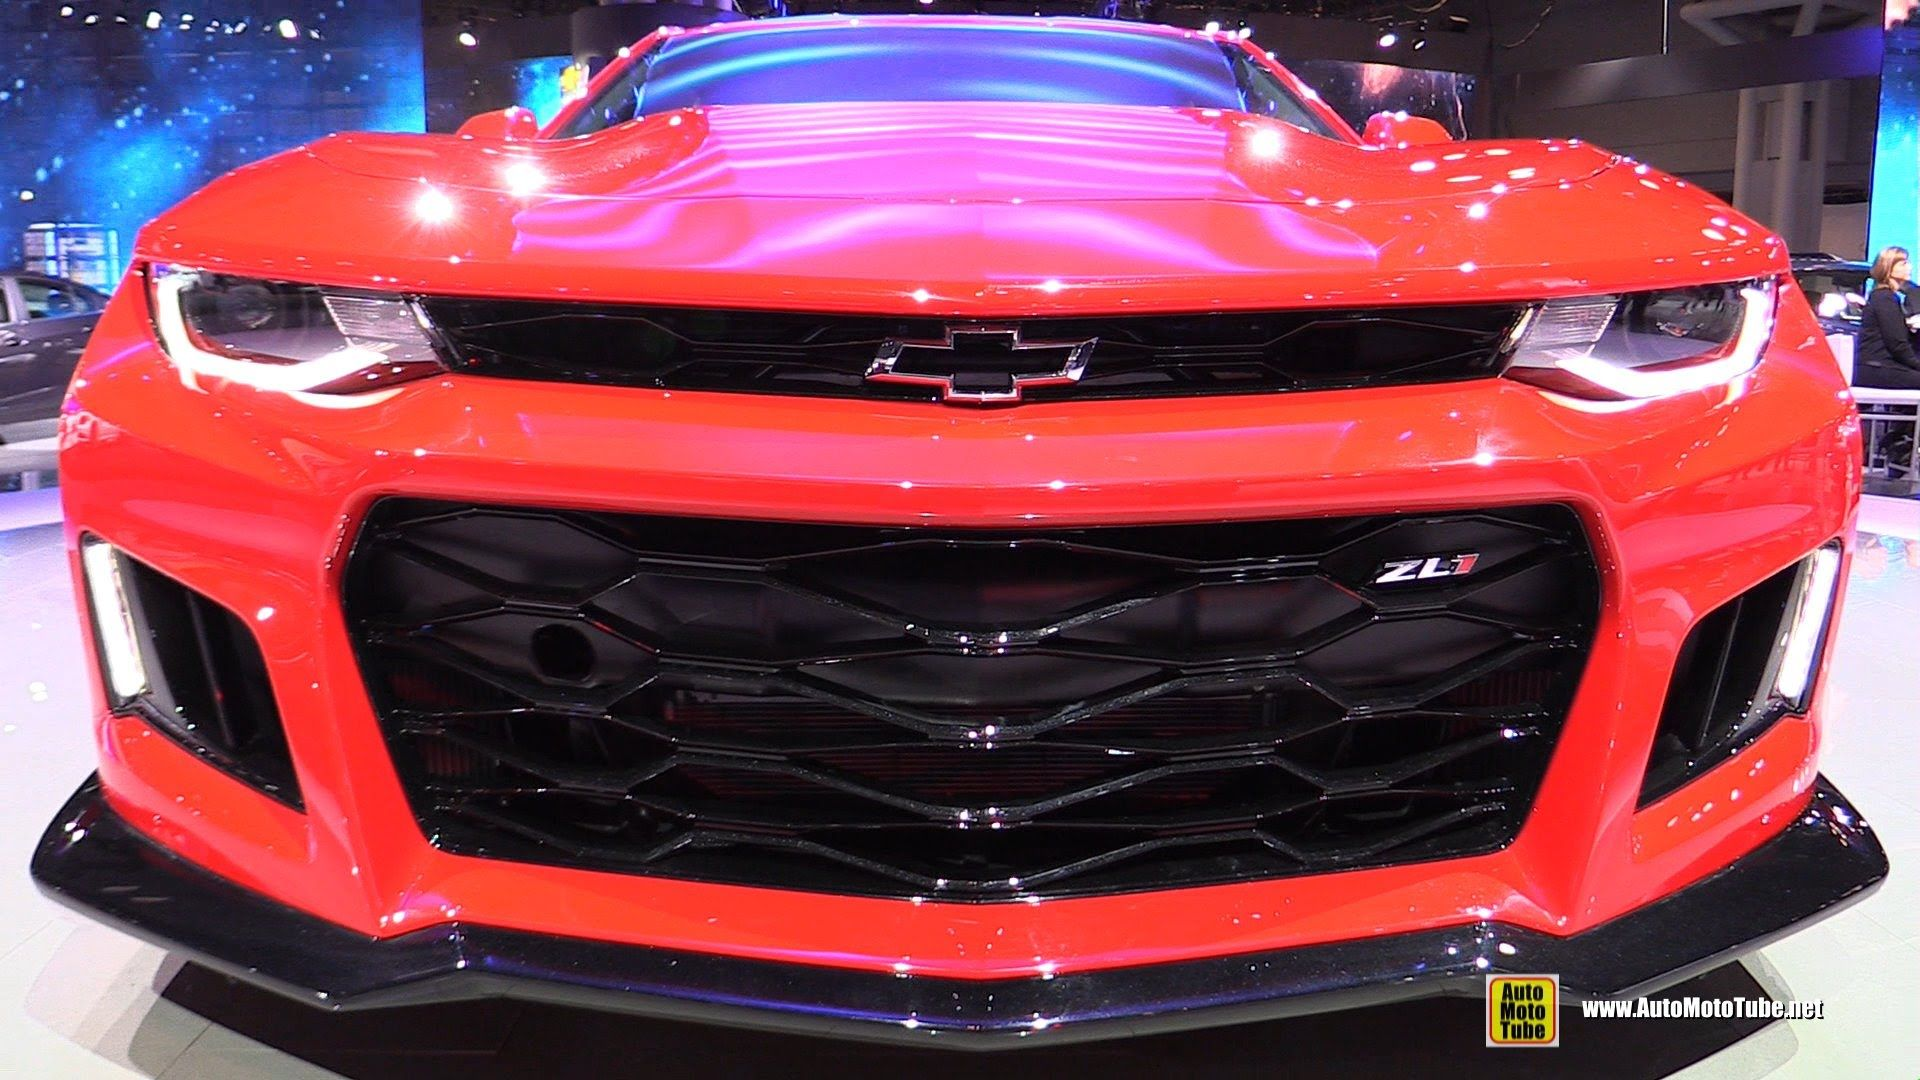 2014 zl1 camaro recaro seats html 2017 2018 cars reviews - 2017 Chevrolet Camaro Exterior And Interior Walkaround Debut At 2016 New York Auto Show